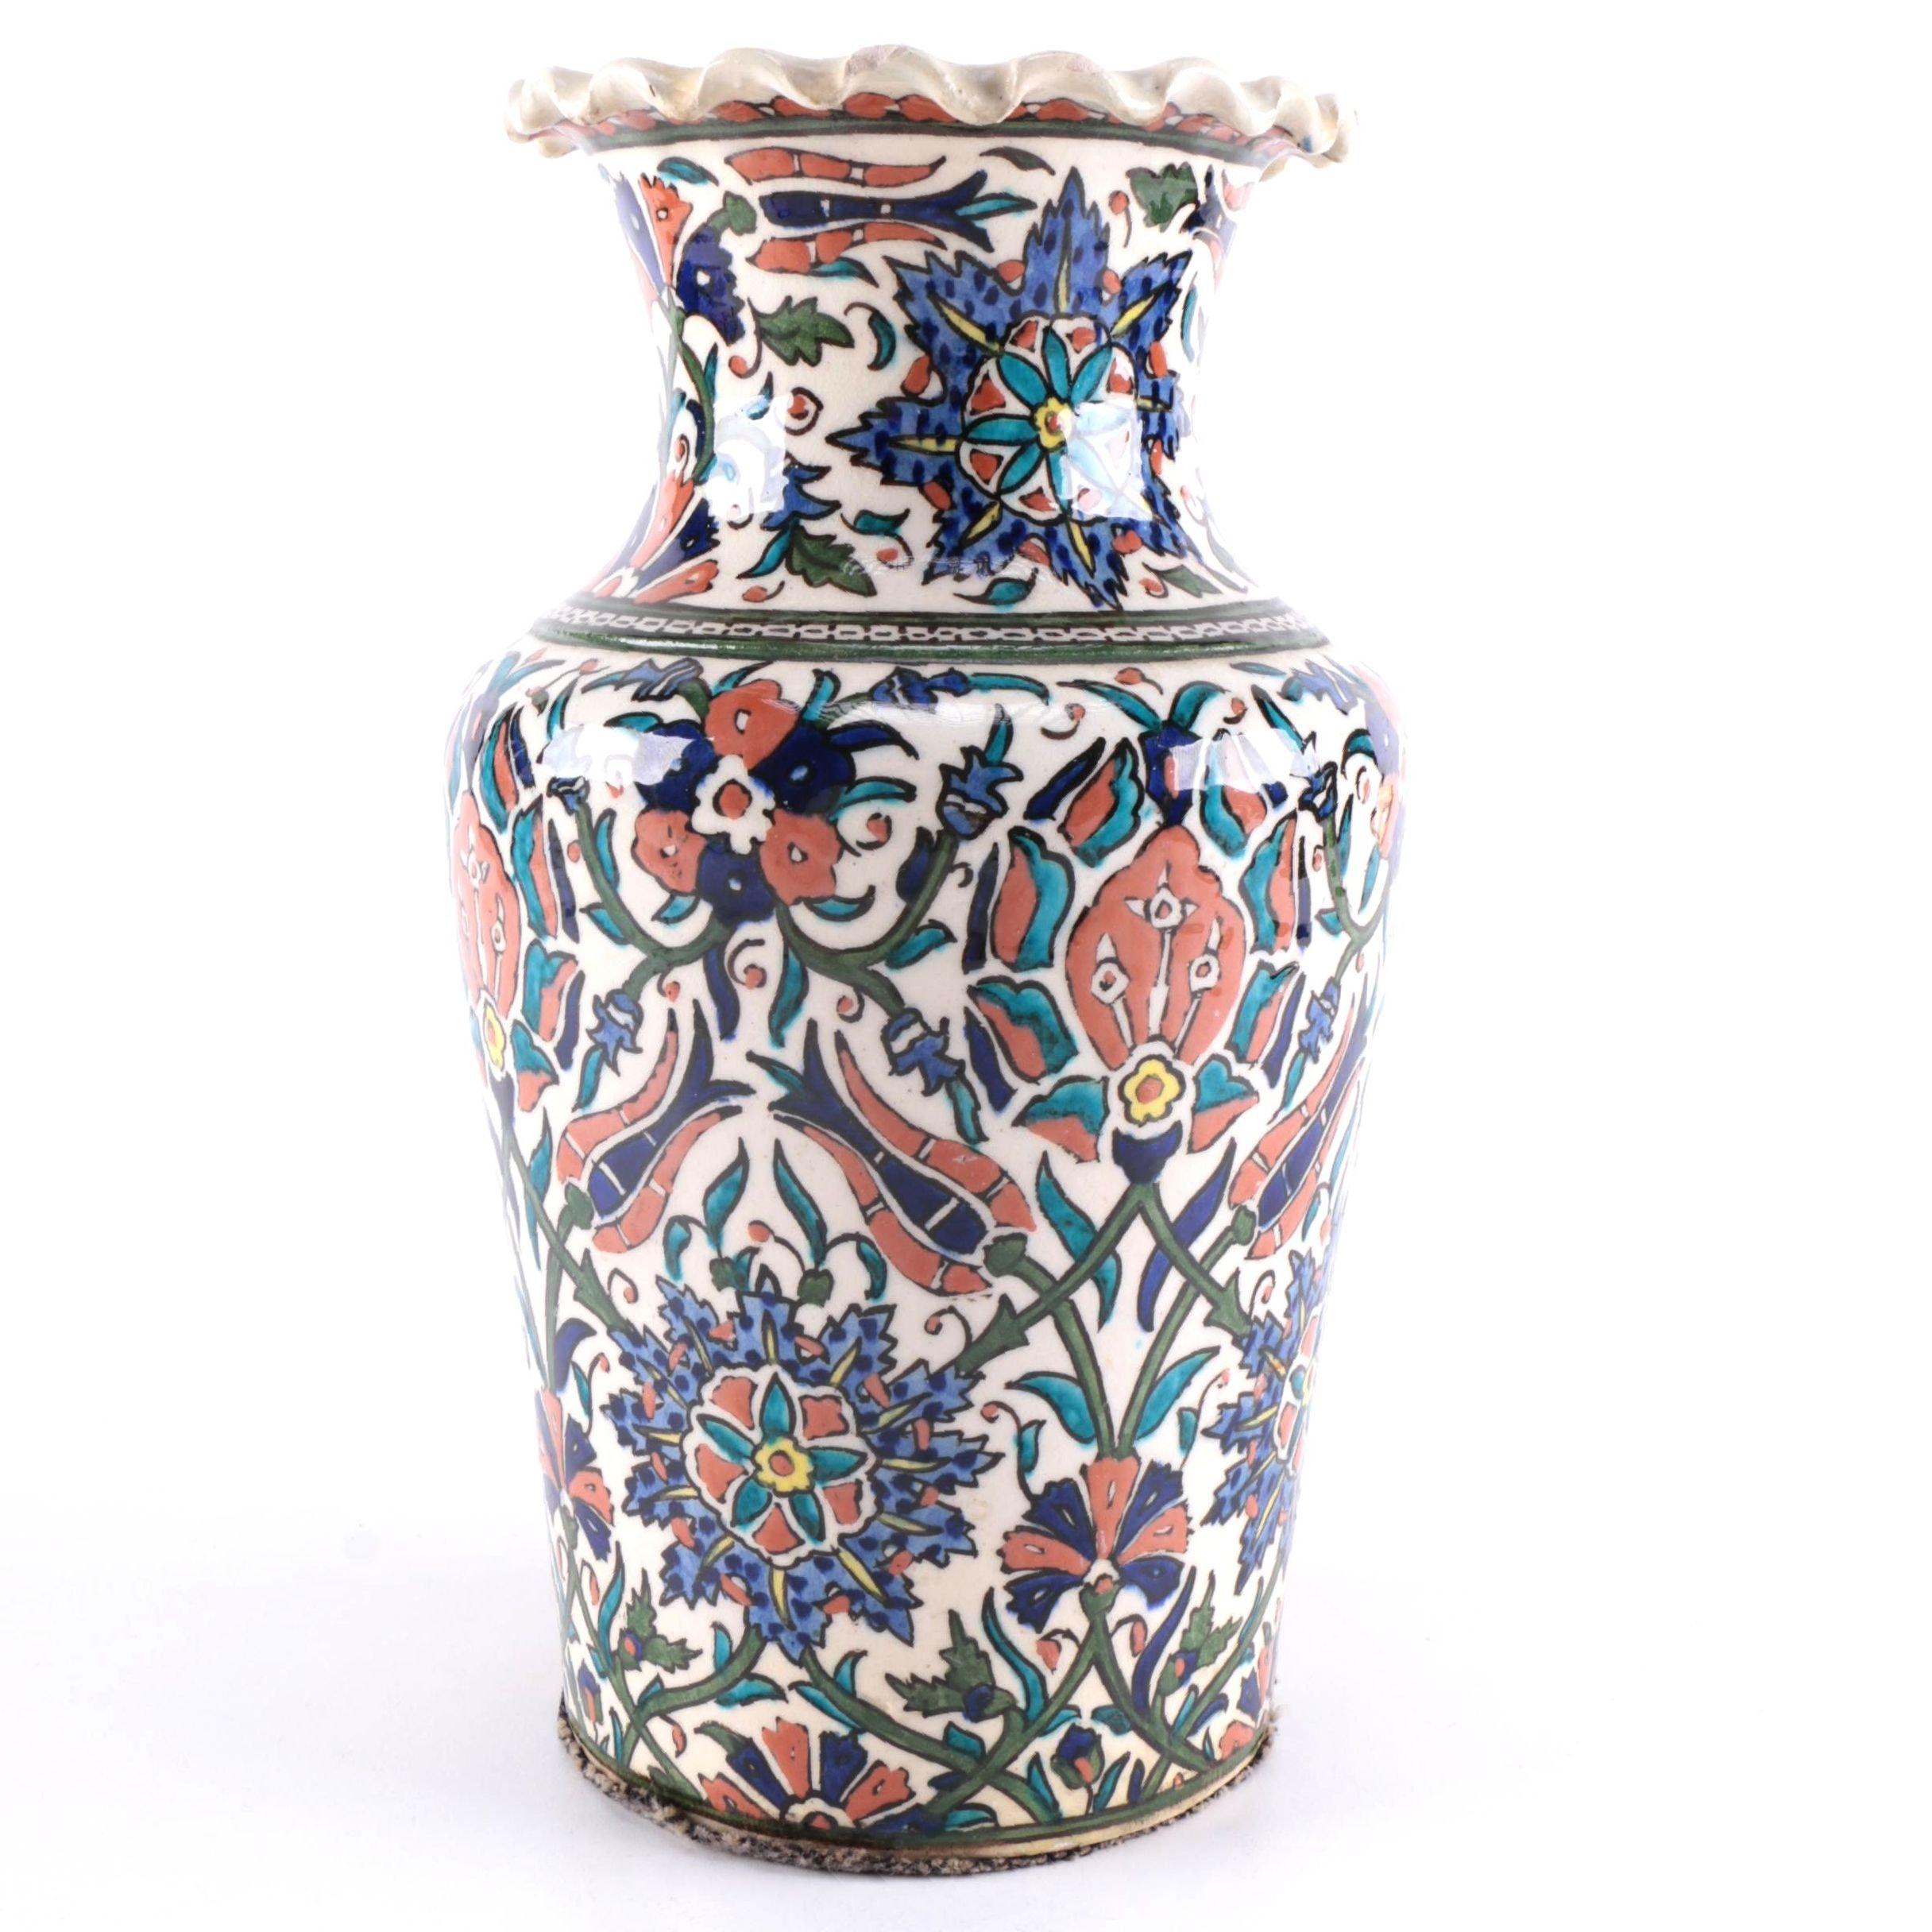 Hand-Painted Iznik-Style Ceramic Vase